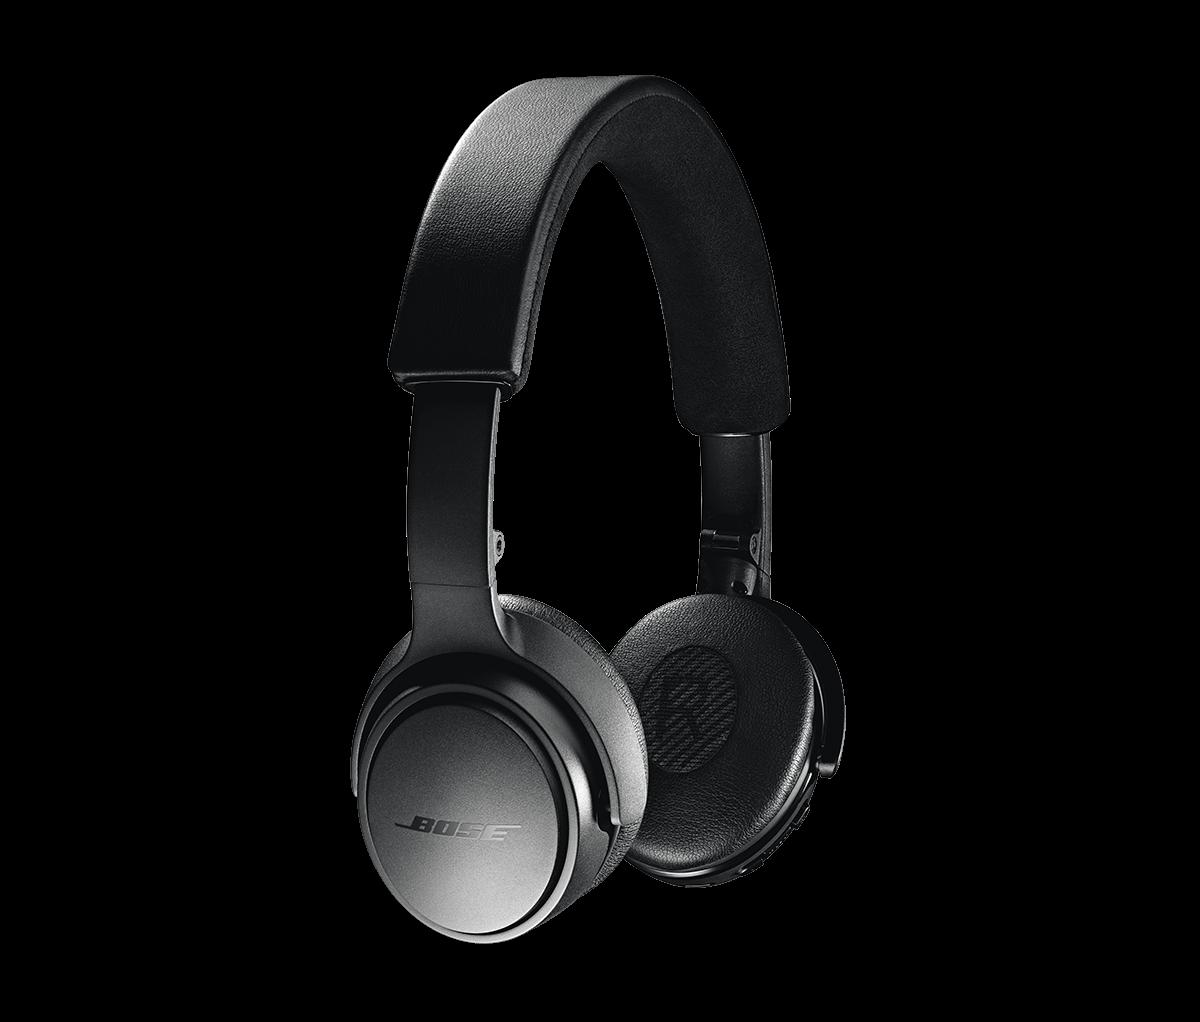 Bose_onear_wireless_headphones